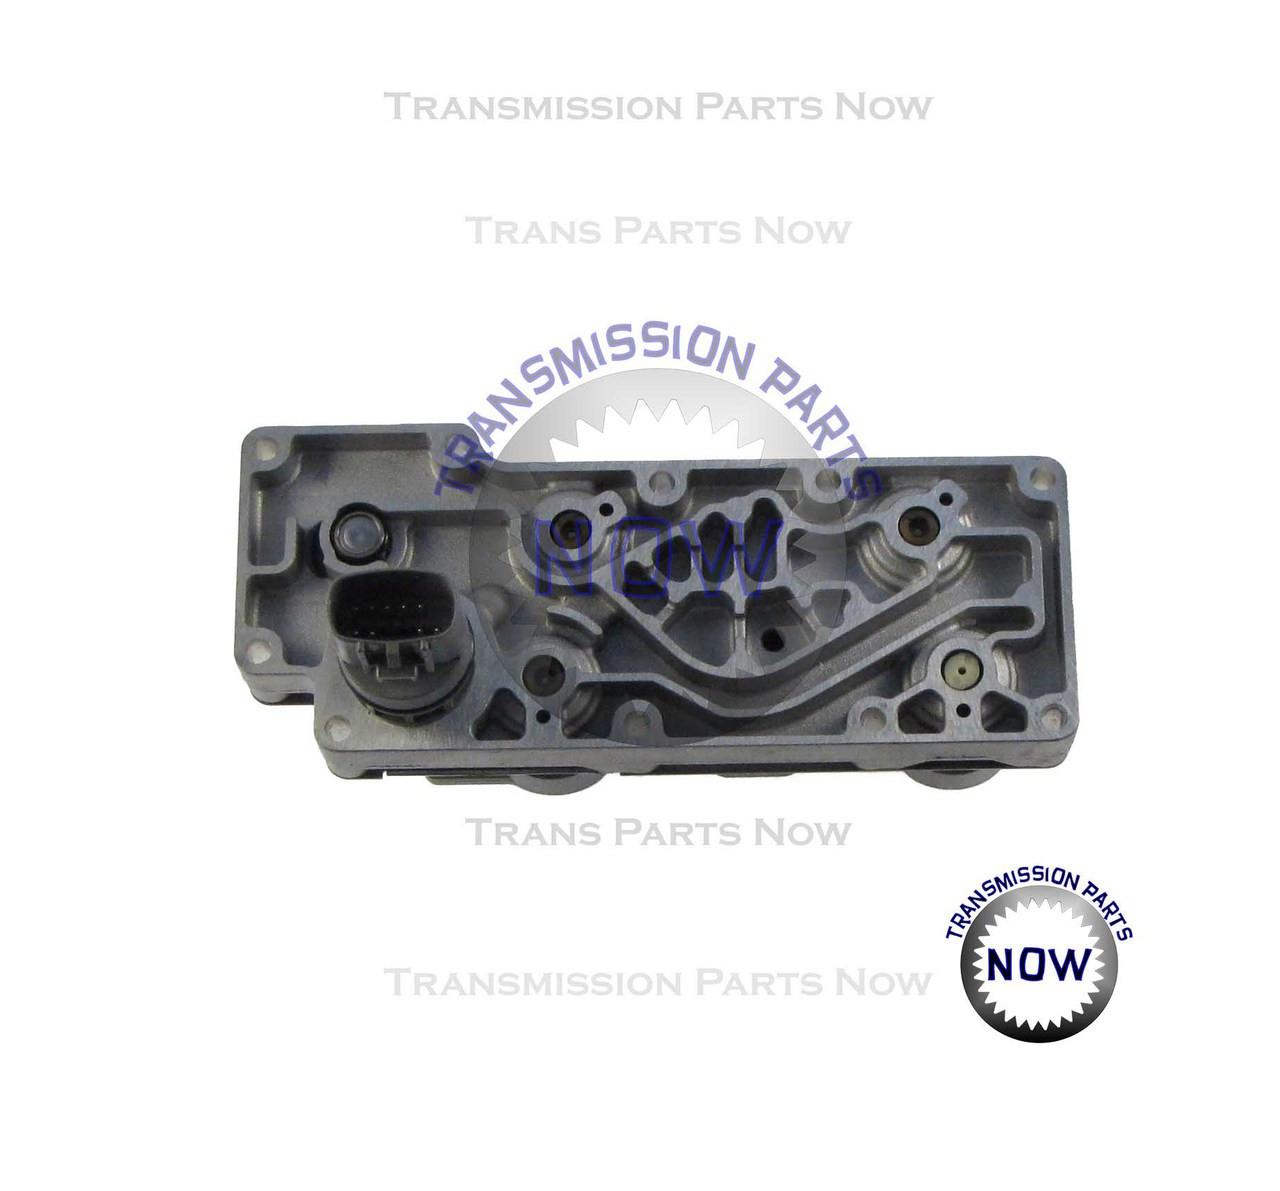 Ford solenoid pack, 4R100, E4OD, PWM, 1998,1999, 2000, 2001, 2002, 2003, 2004, 2005, F150, F250,F350, E250, E350